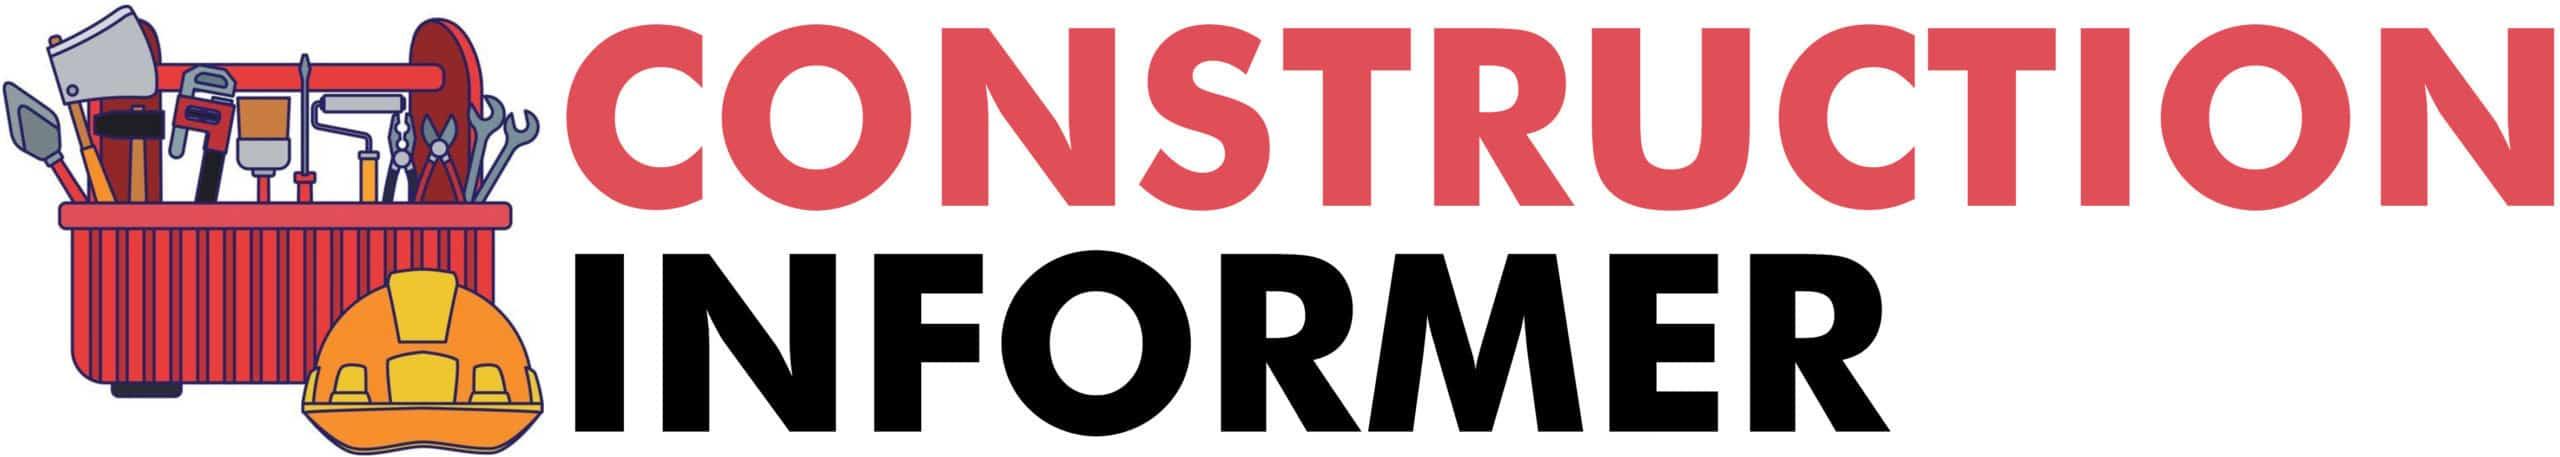 Construction Informer Blog